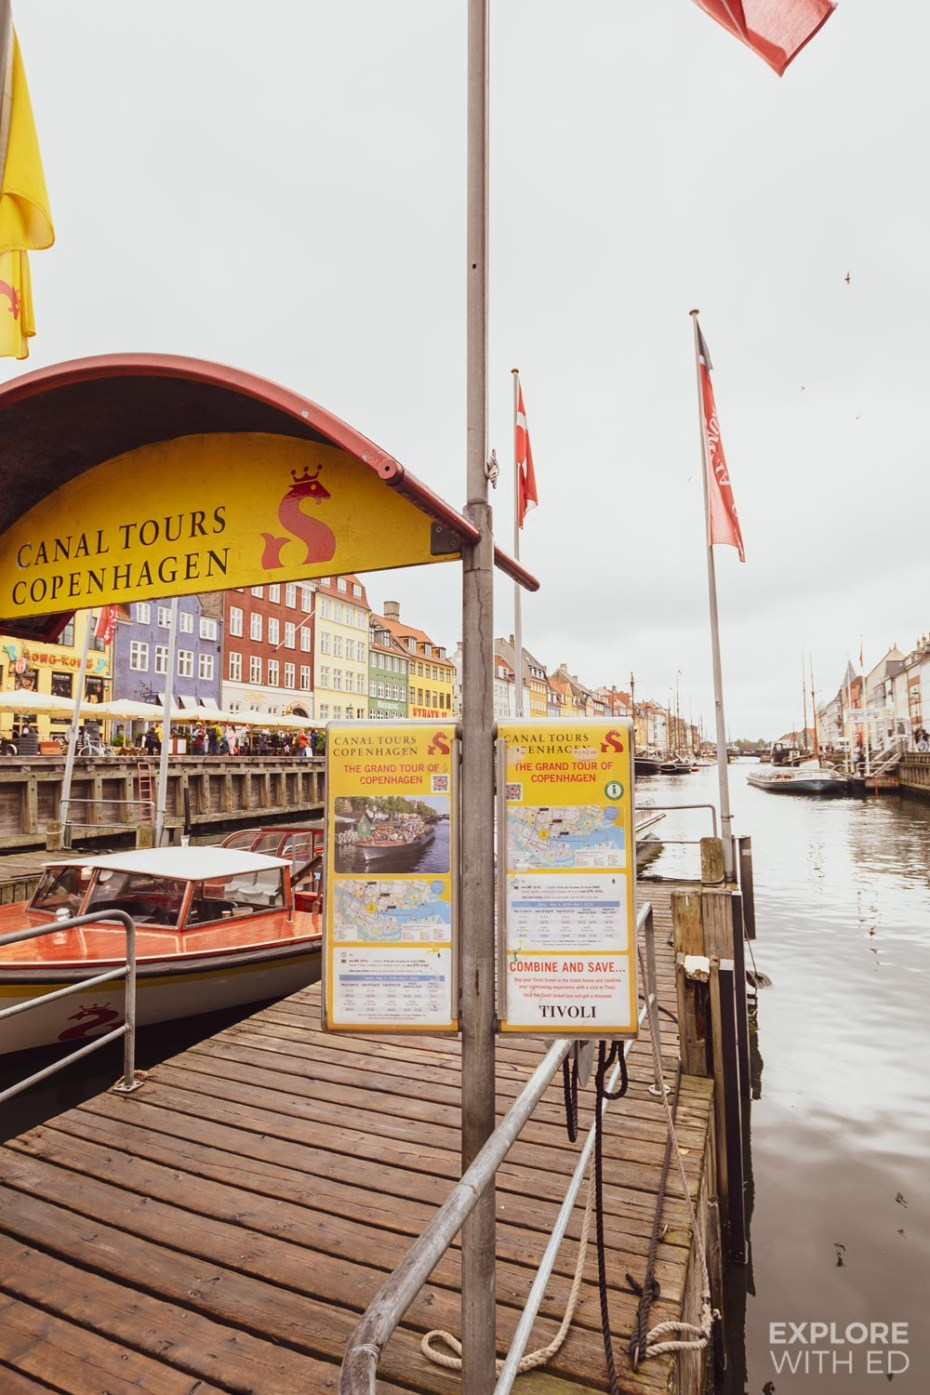 Canal tours in Copenhagen from Nyhavn Harbour